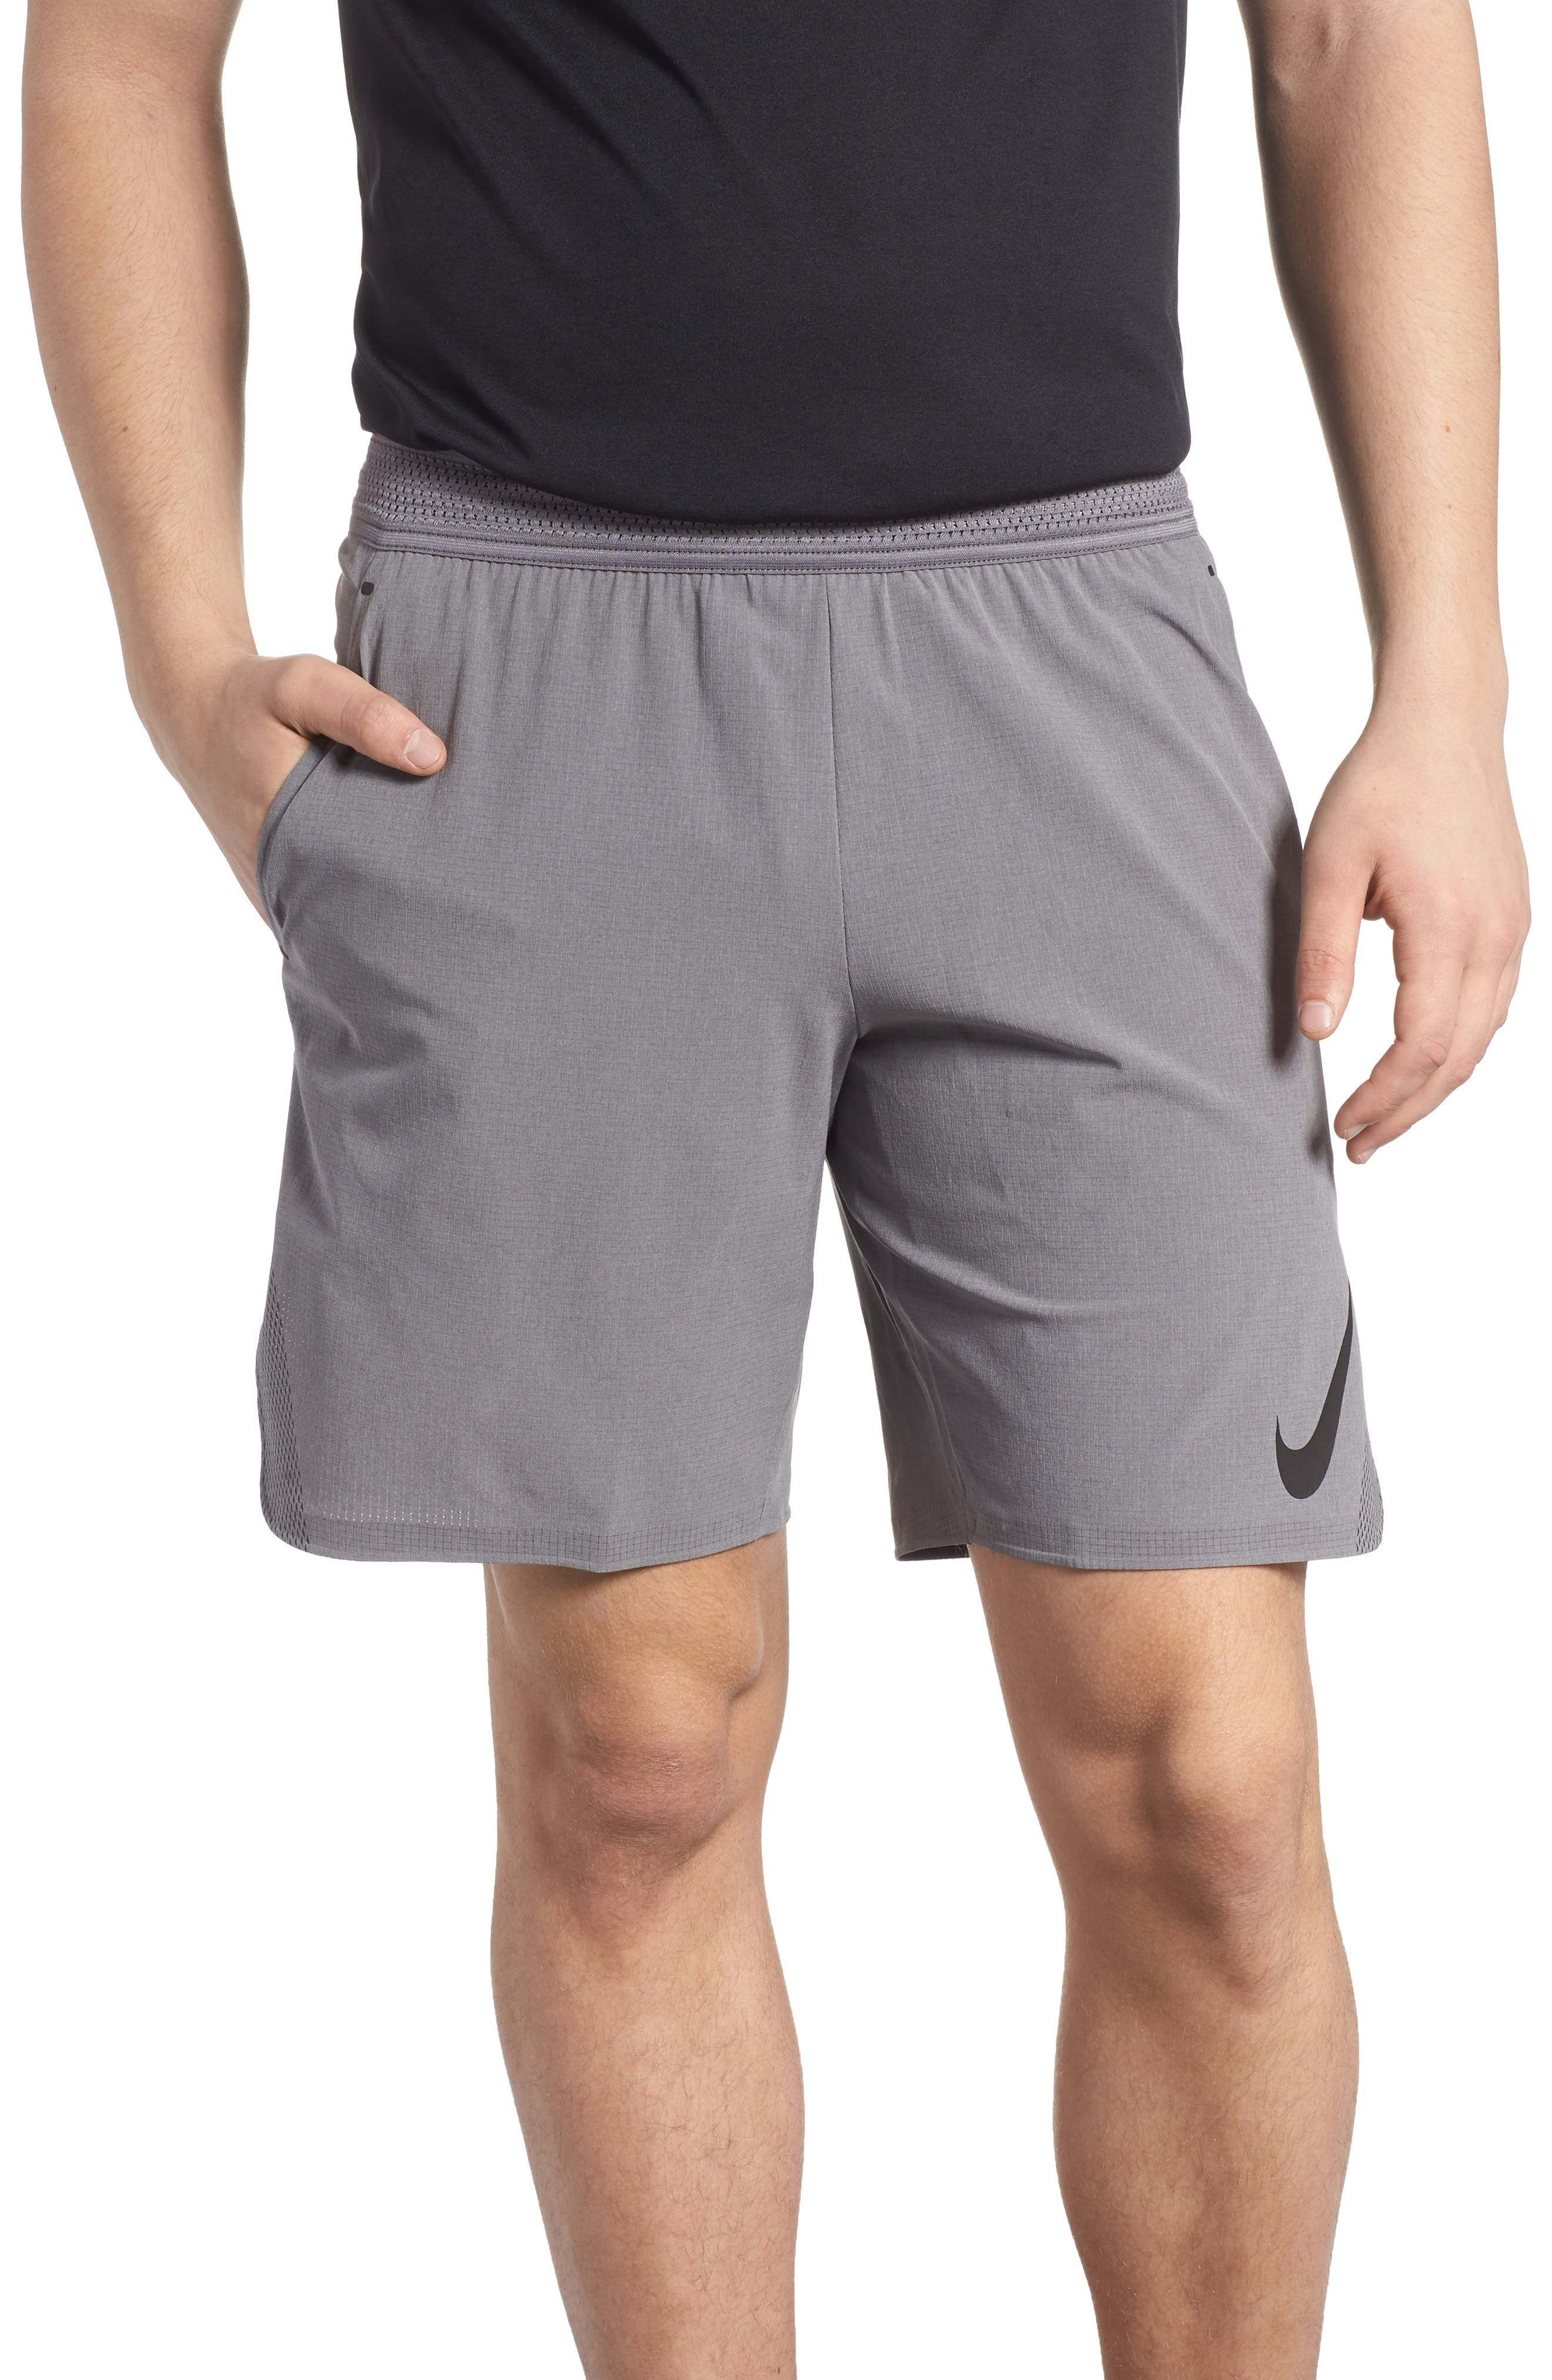 Repel 3.0 Flex Training Shorts,                         Main,                         color, Gun Smoke/ Grey/ Black